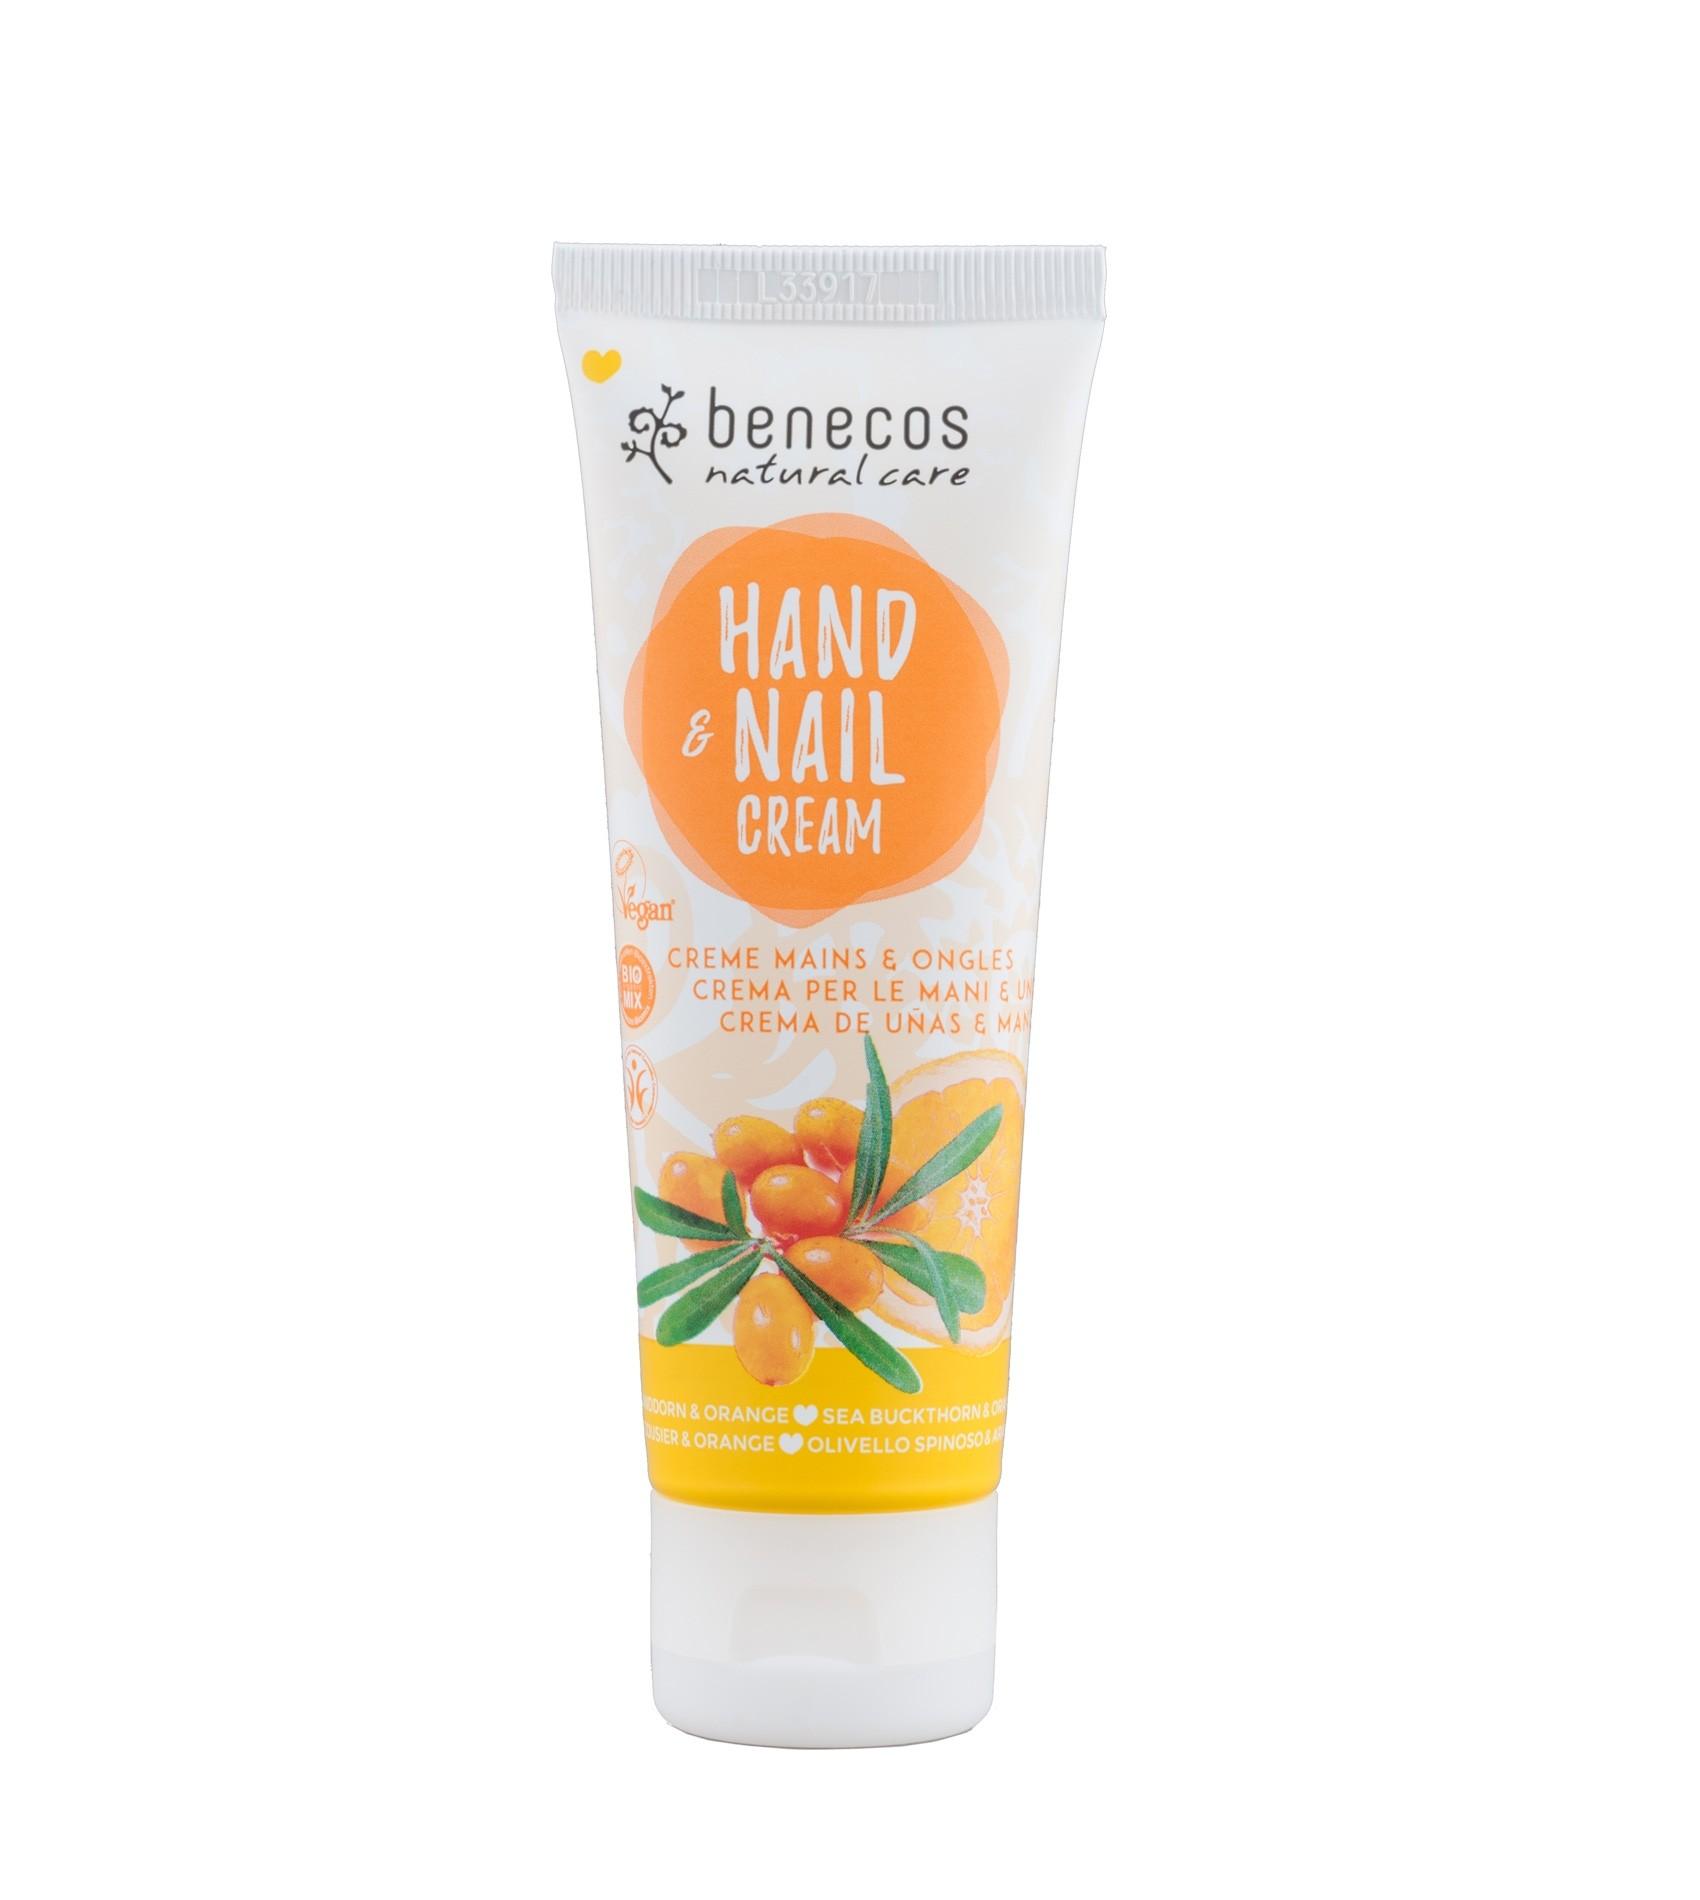 Benecos Vegan Hand & Nail Cream Sea Buckthorn & Orange